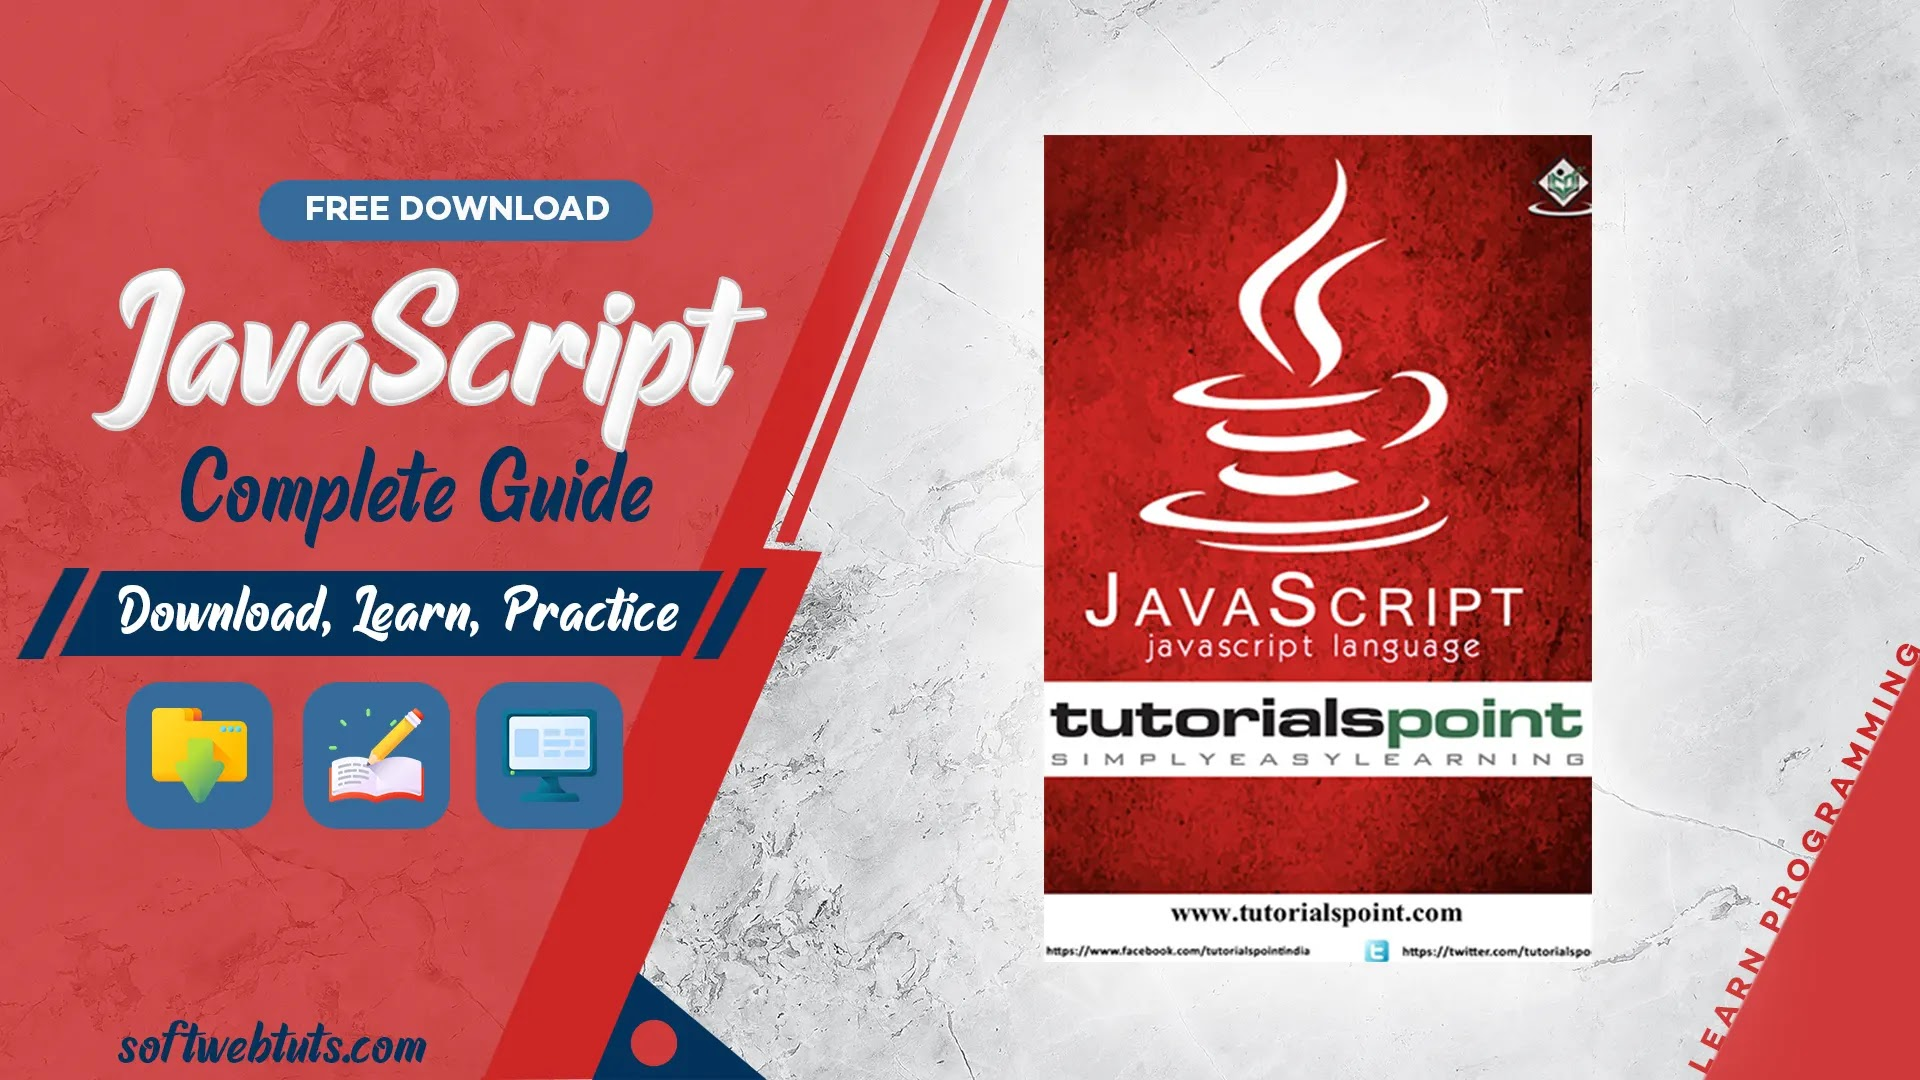 JavaScript Tutorial PDF for Beginners - Complete PDF Guide